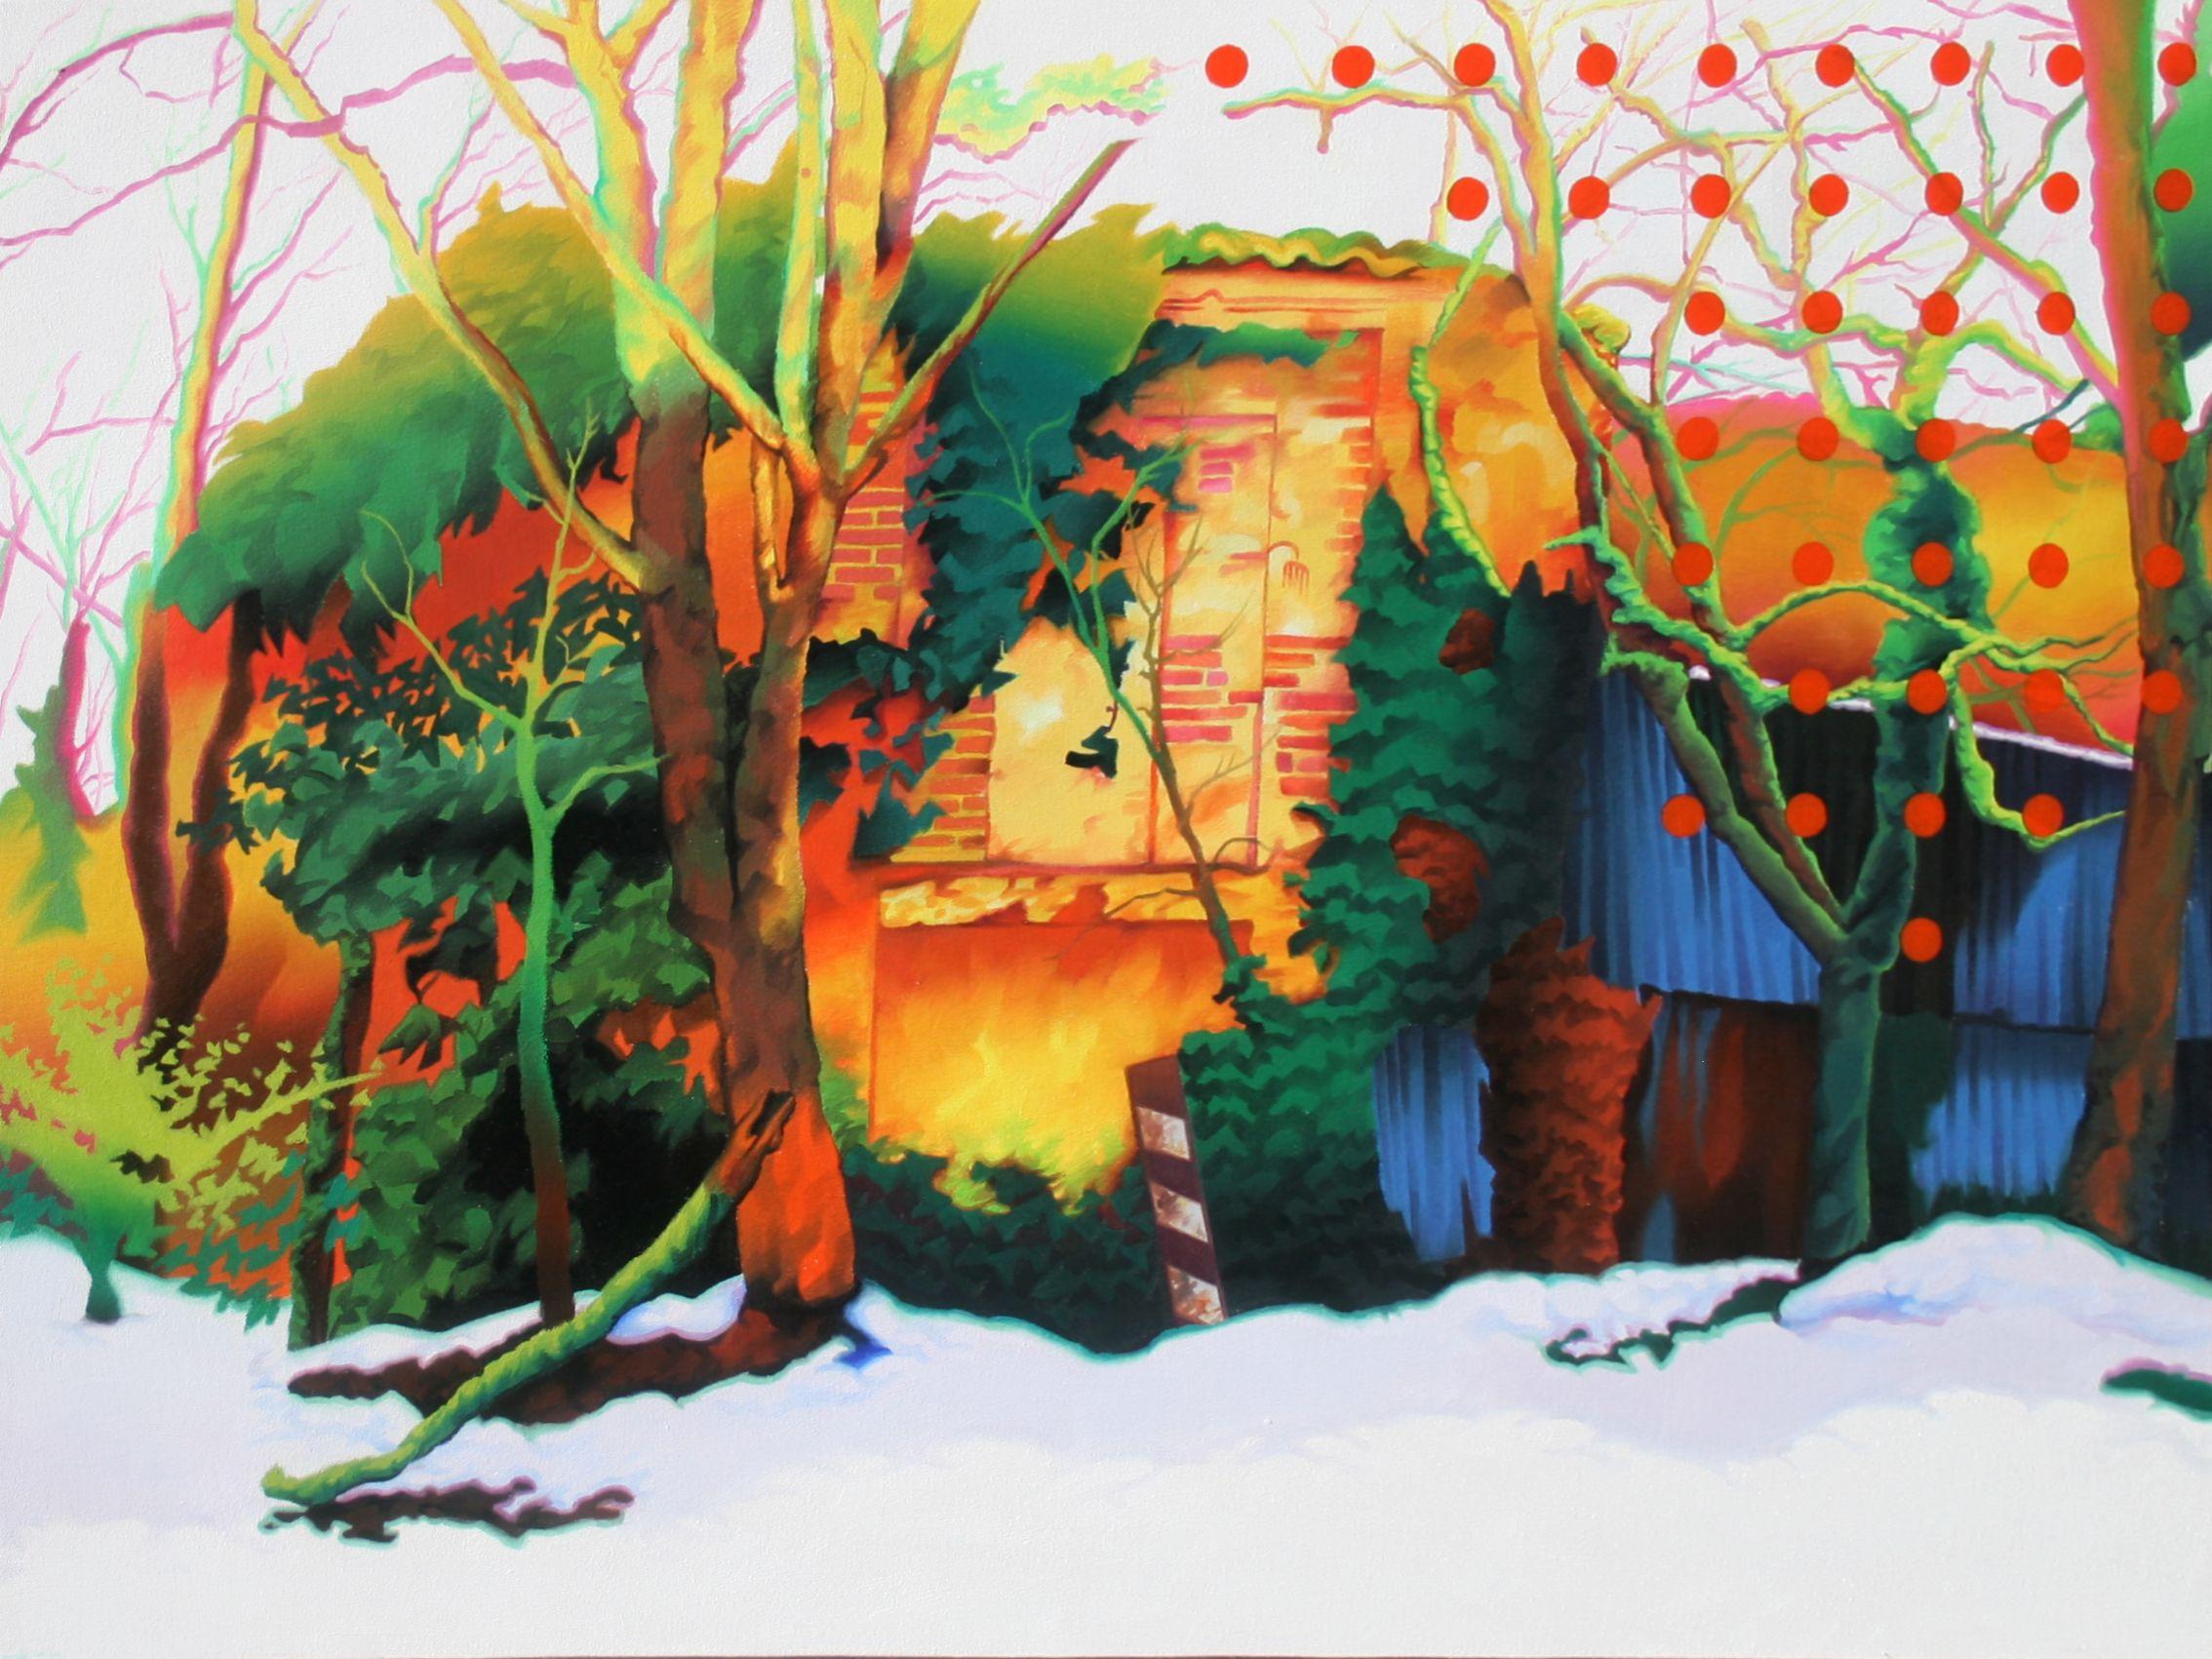 19december_2013_oil on canvas_60x80cm